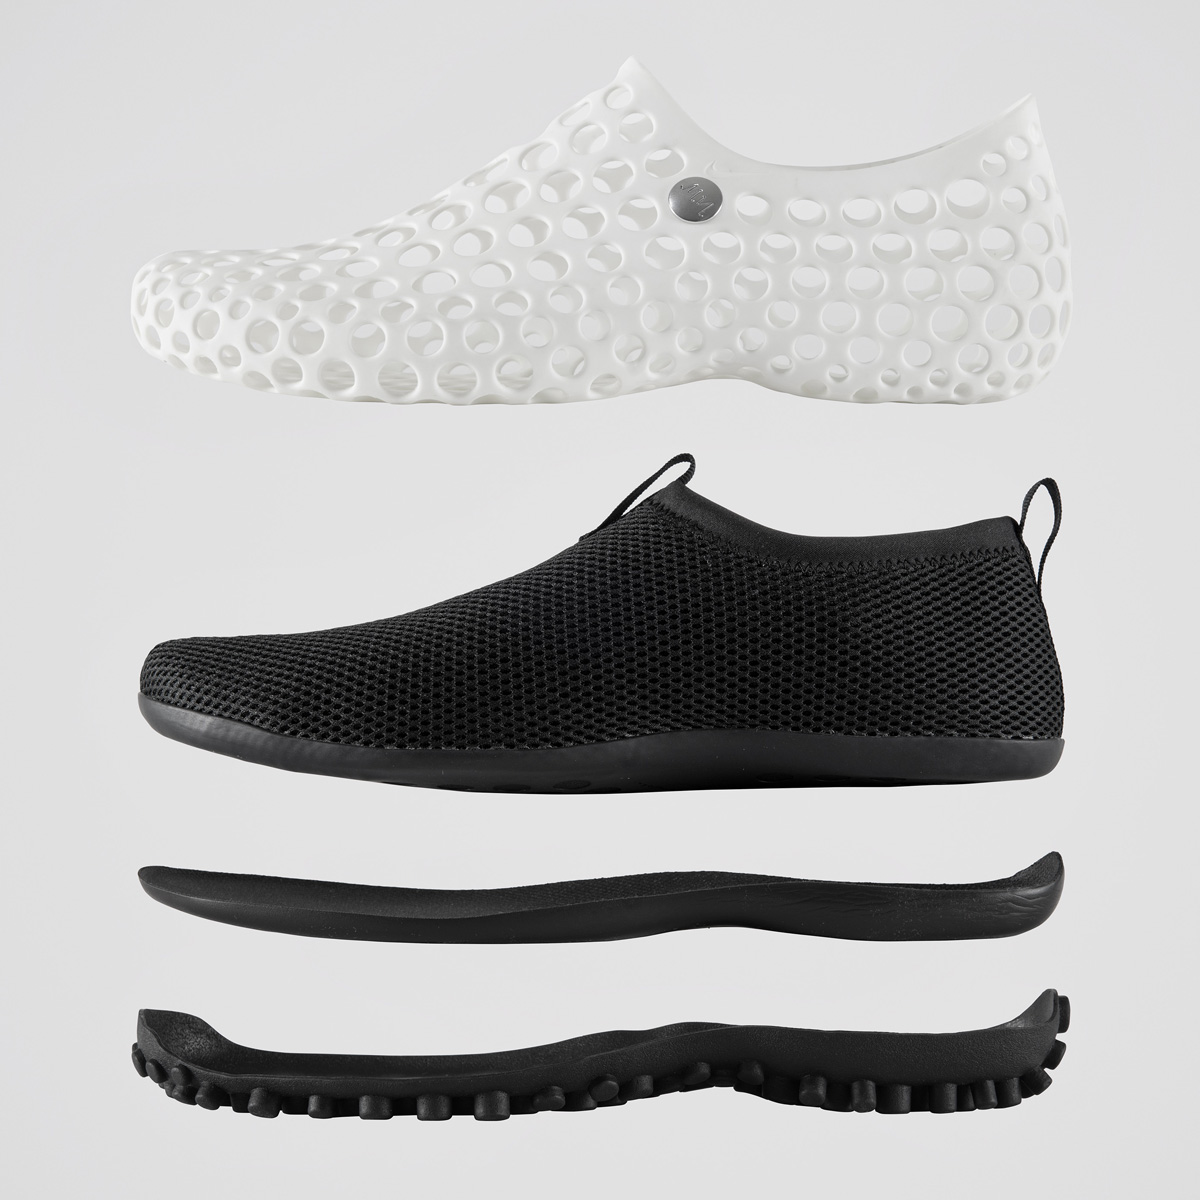 promo code b3165 7a28f ... Nike Reintroduces Marc Newson s Zvezdochka Shoe - COOL HUNTING ...